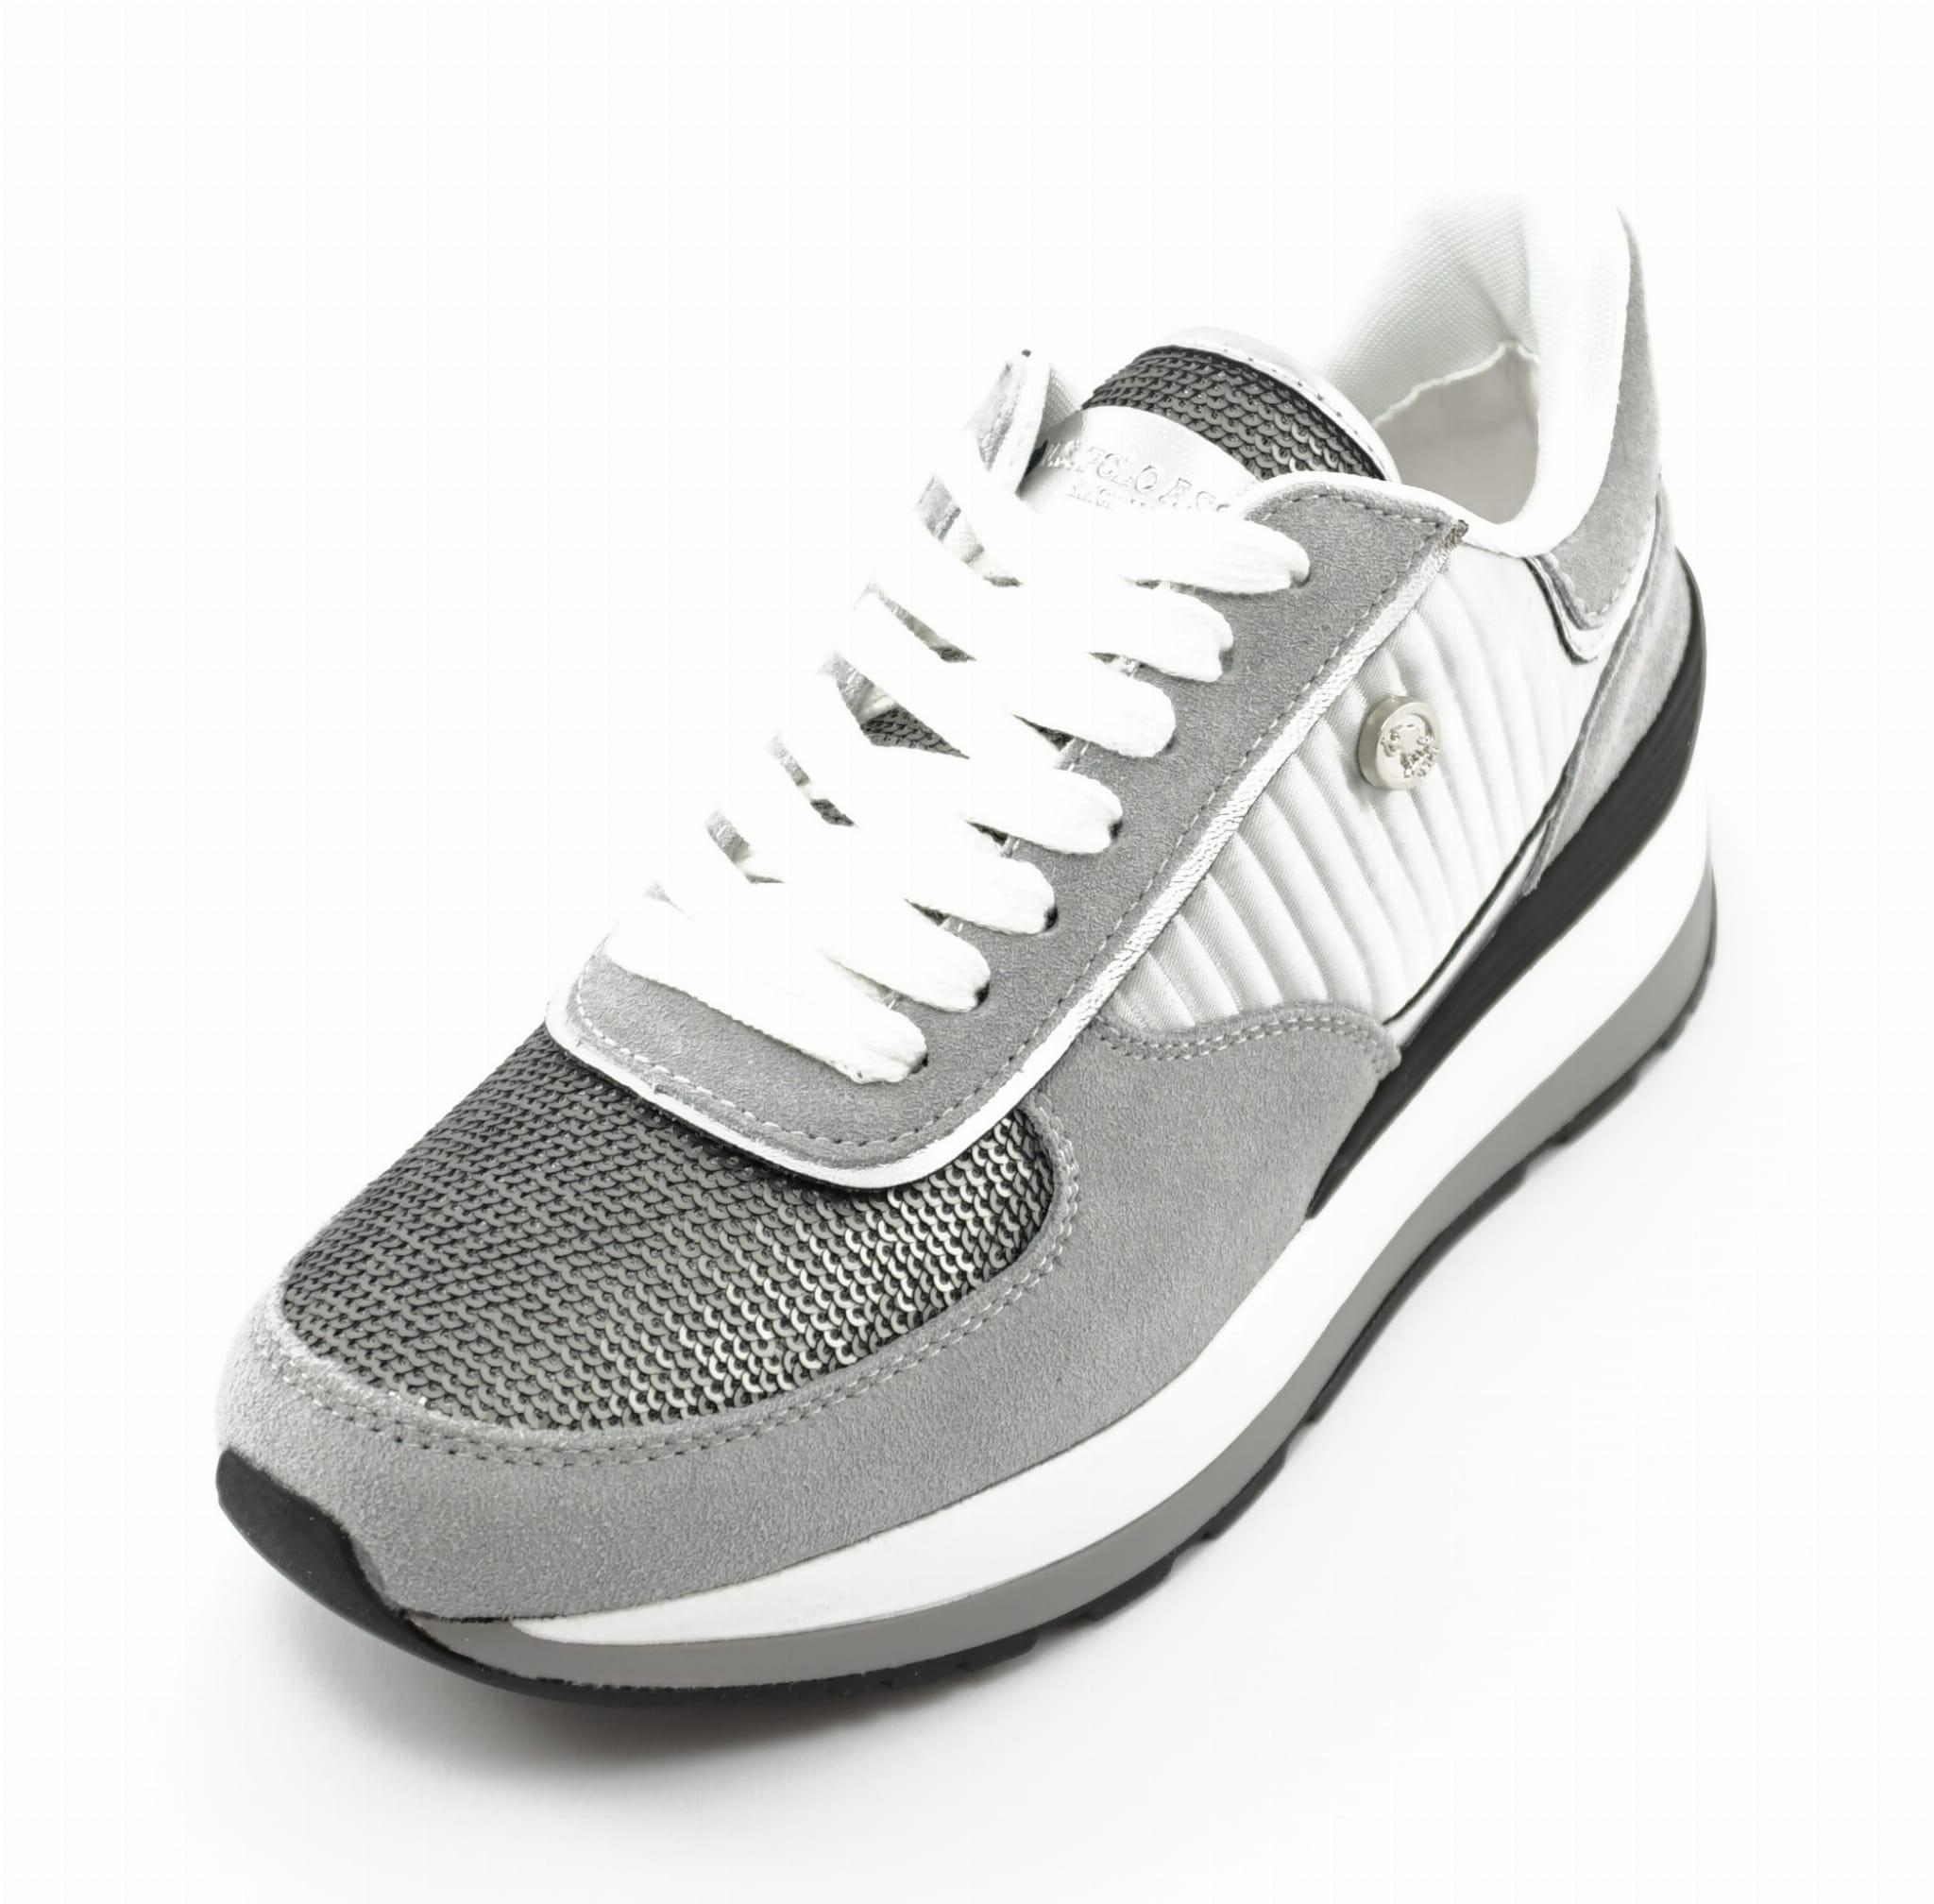 Buty sportowe damskie Sneakersy U S Polo Valery 3 paillettes